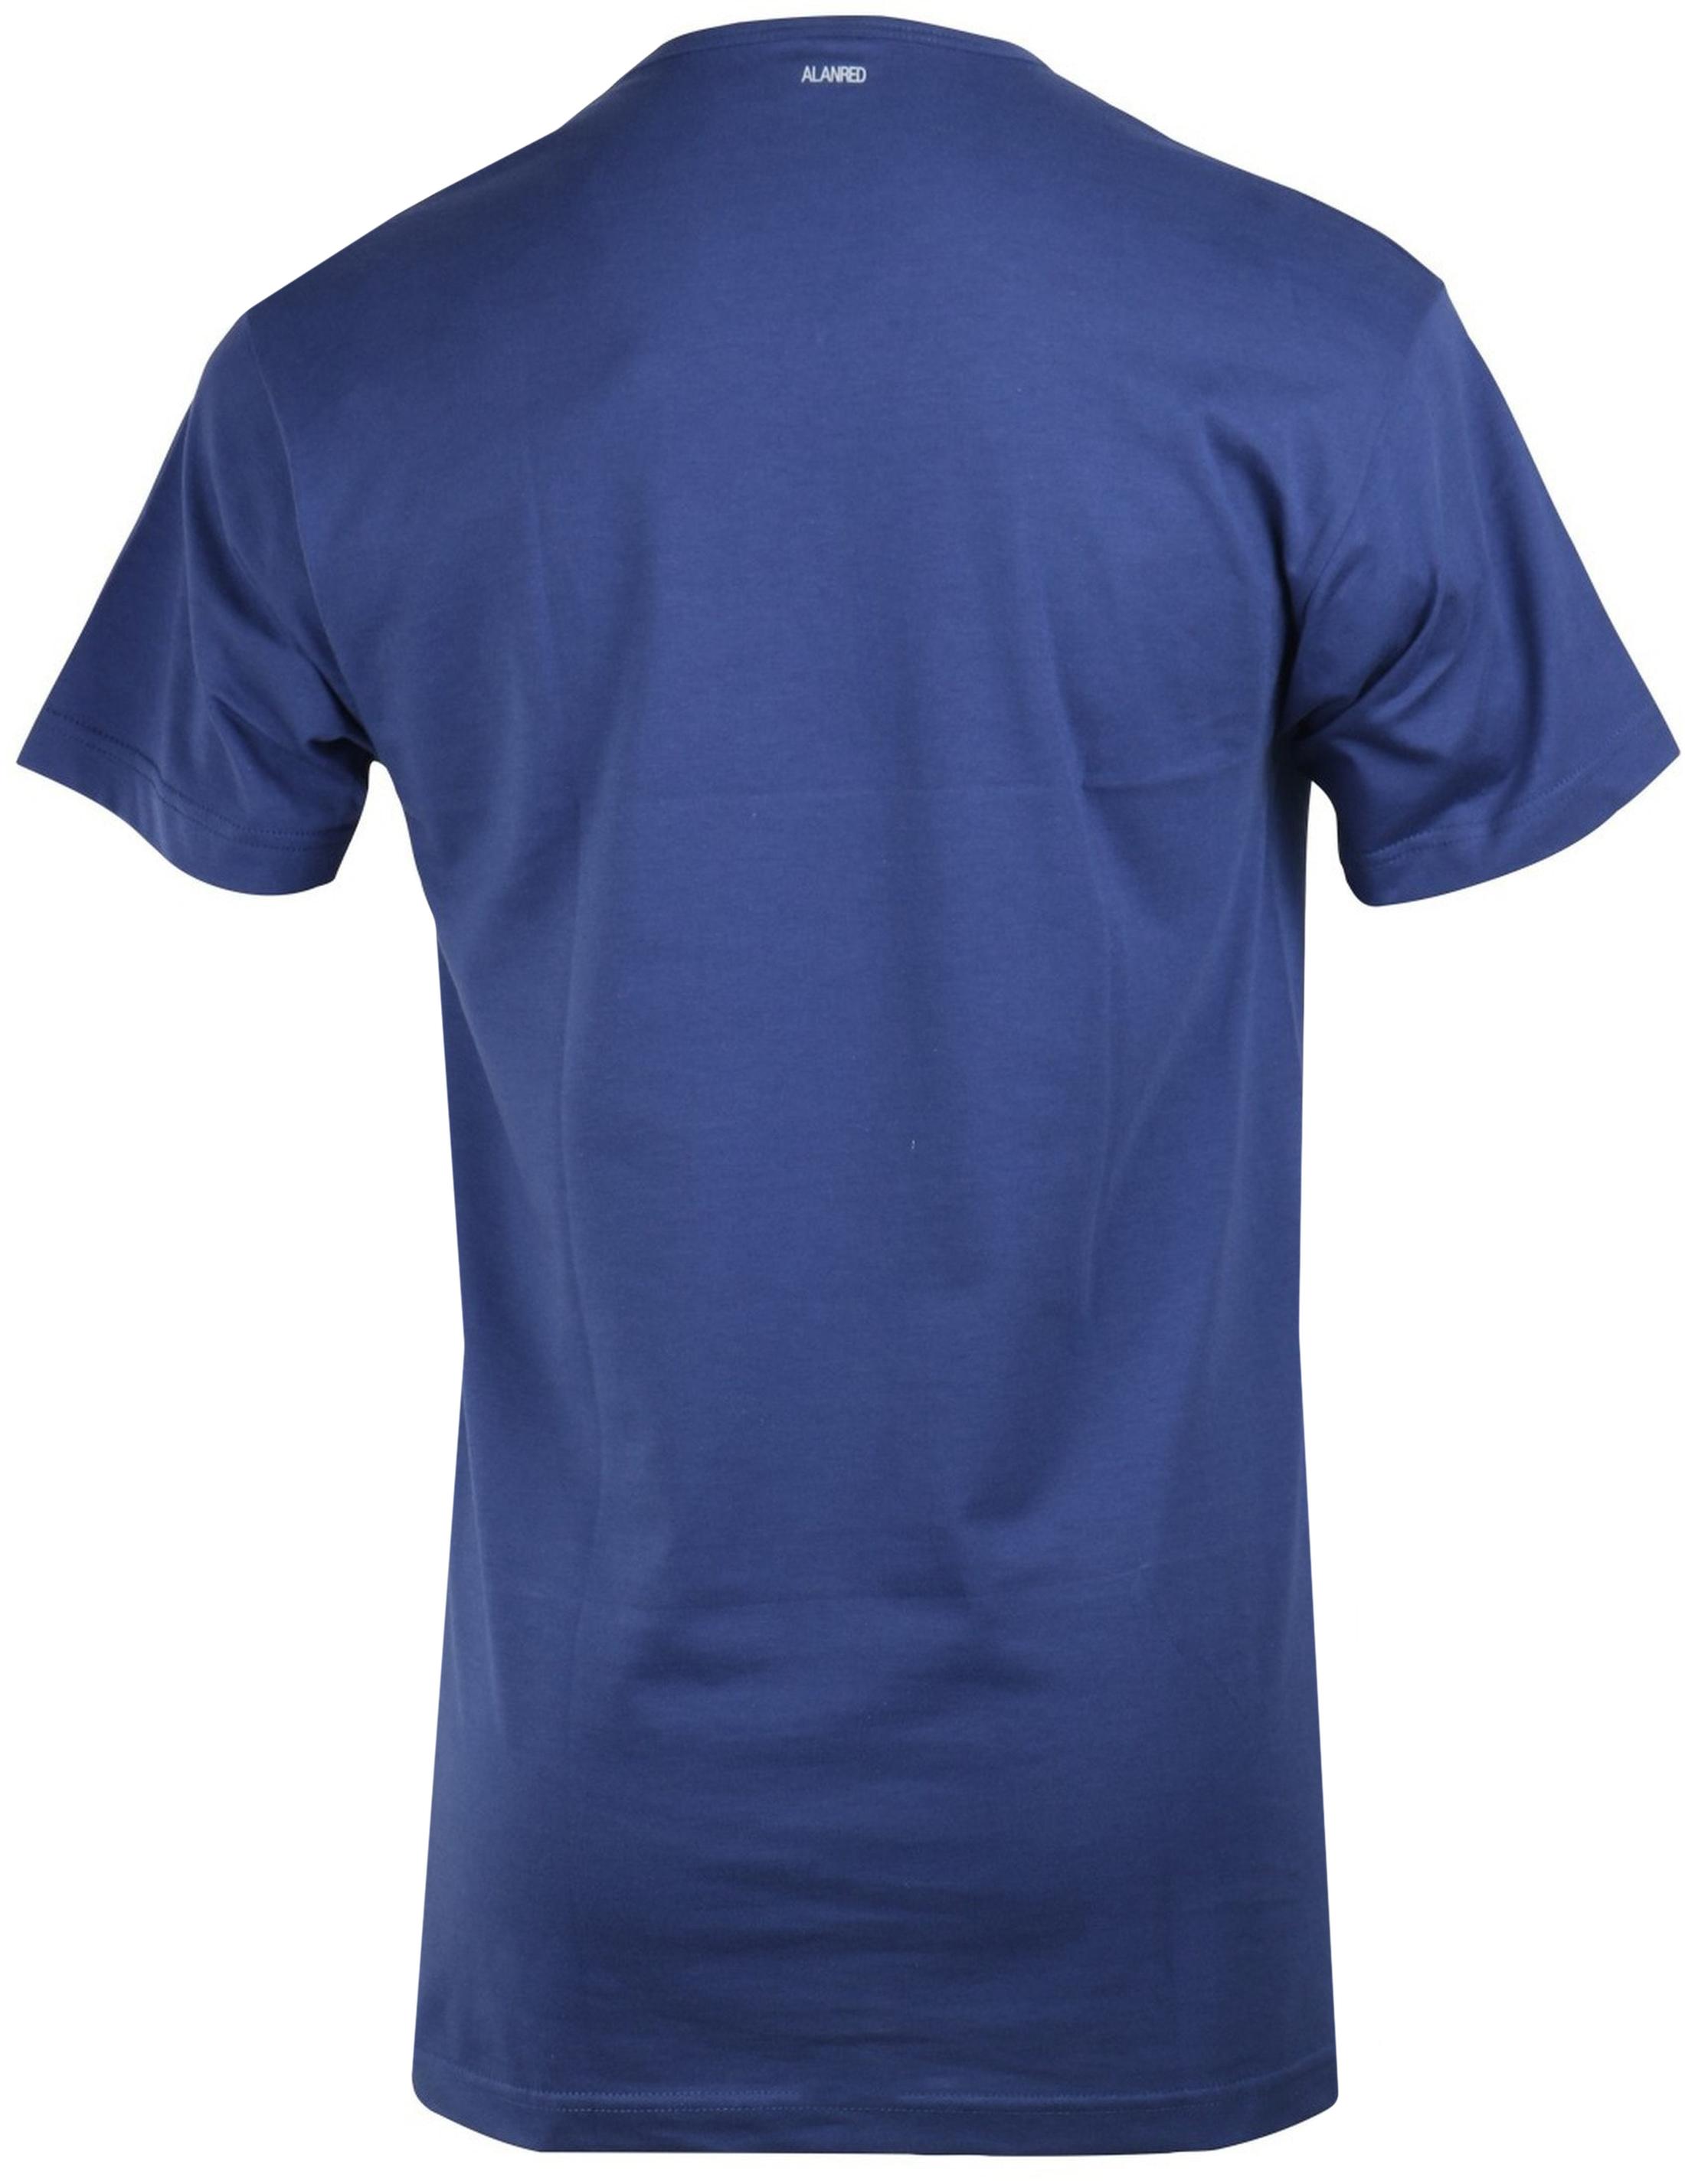 Alan Red T-Shirt V-Ausschnitt Vermont Marineblau (1er-Pack) foto 2